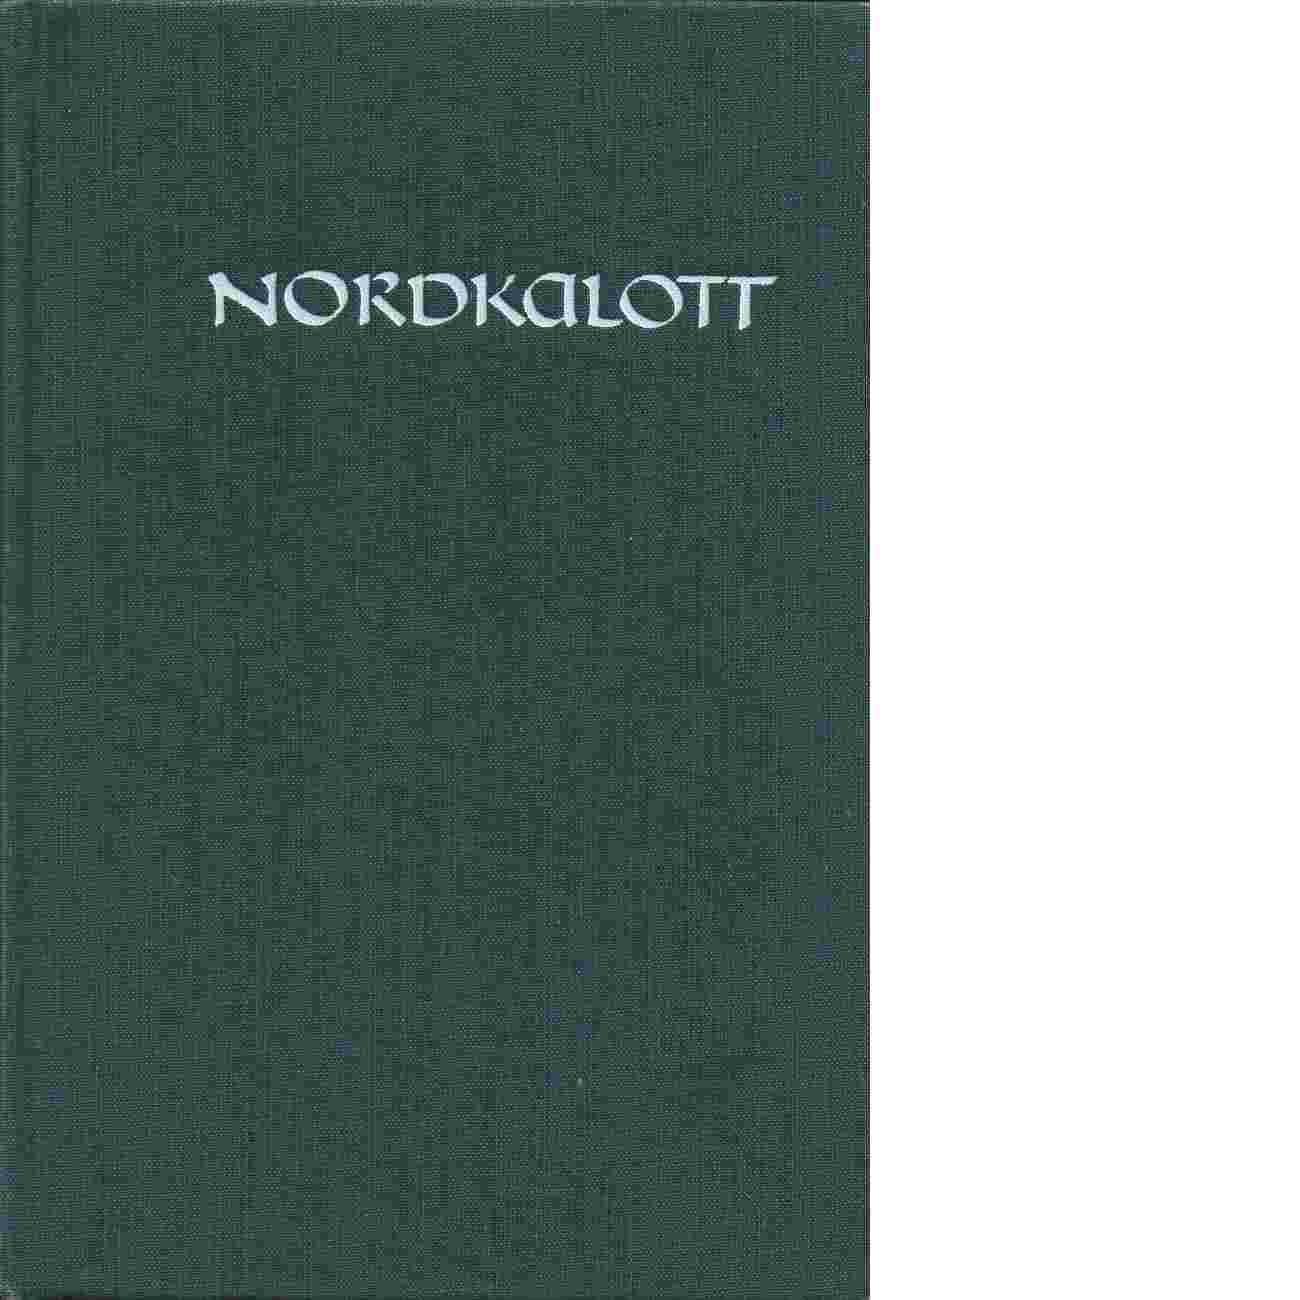 Nordkalott - Lidman, Hans